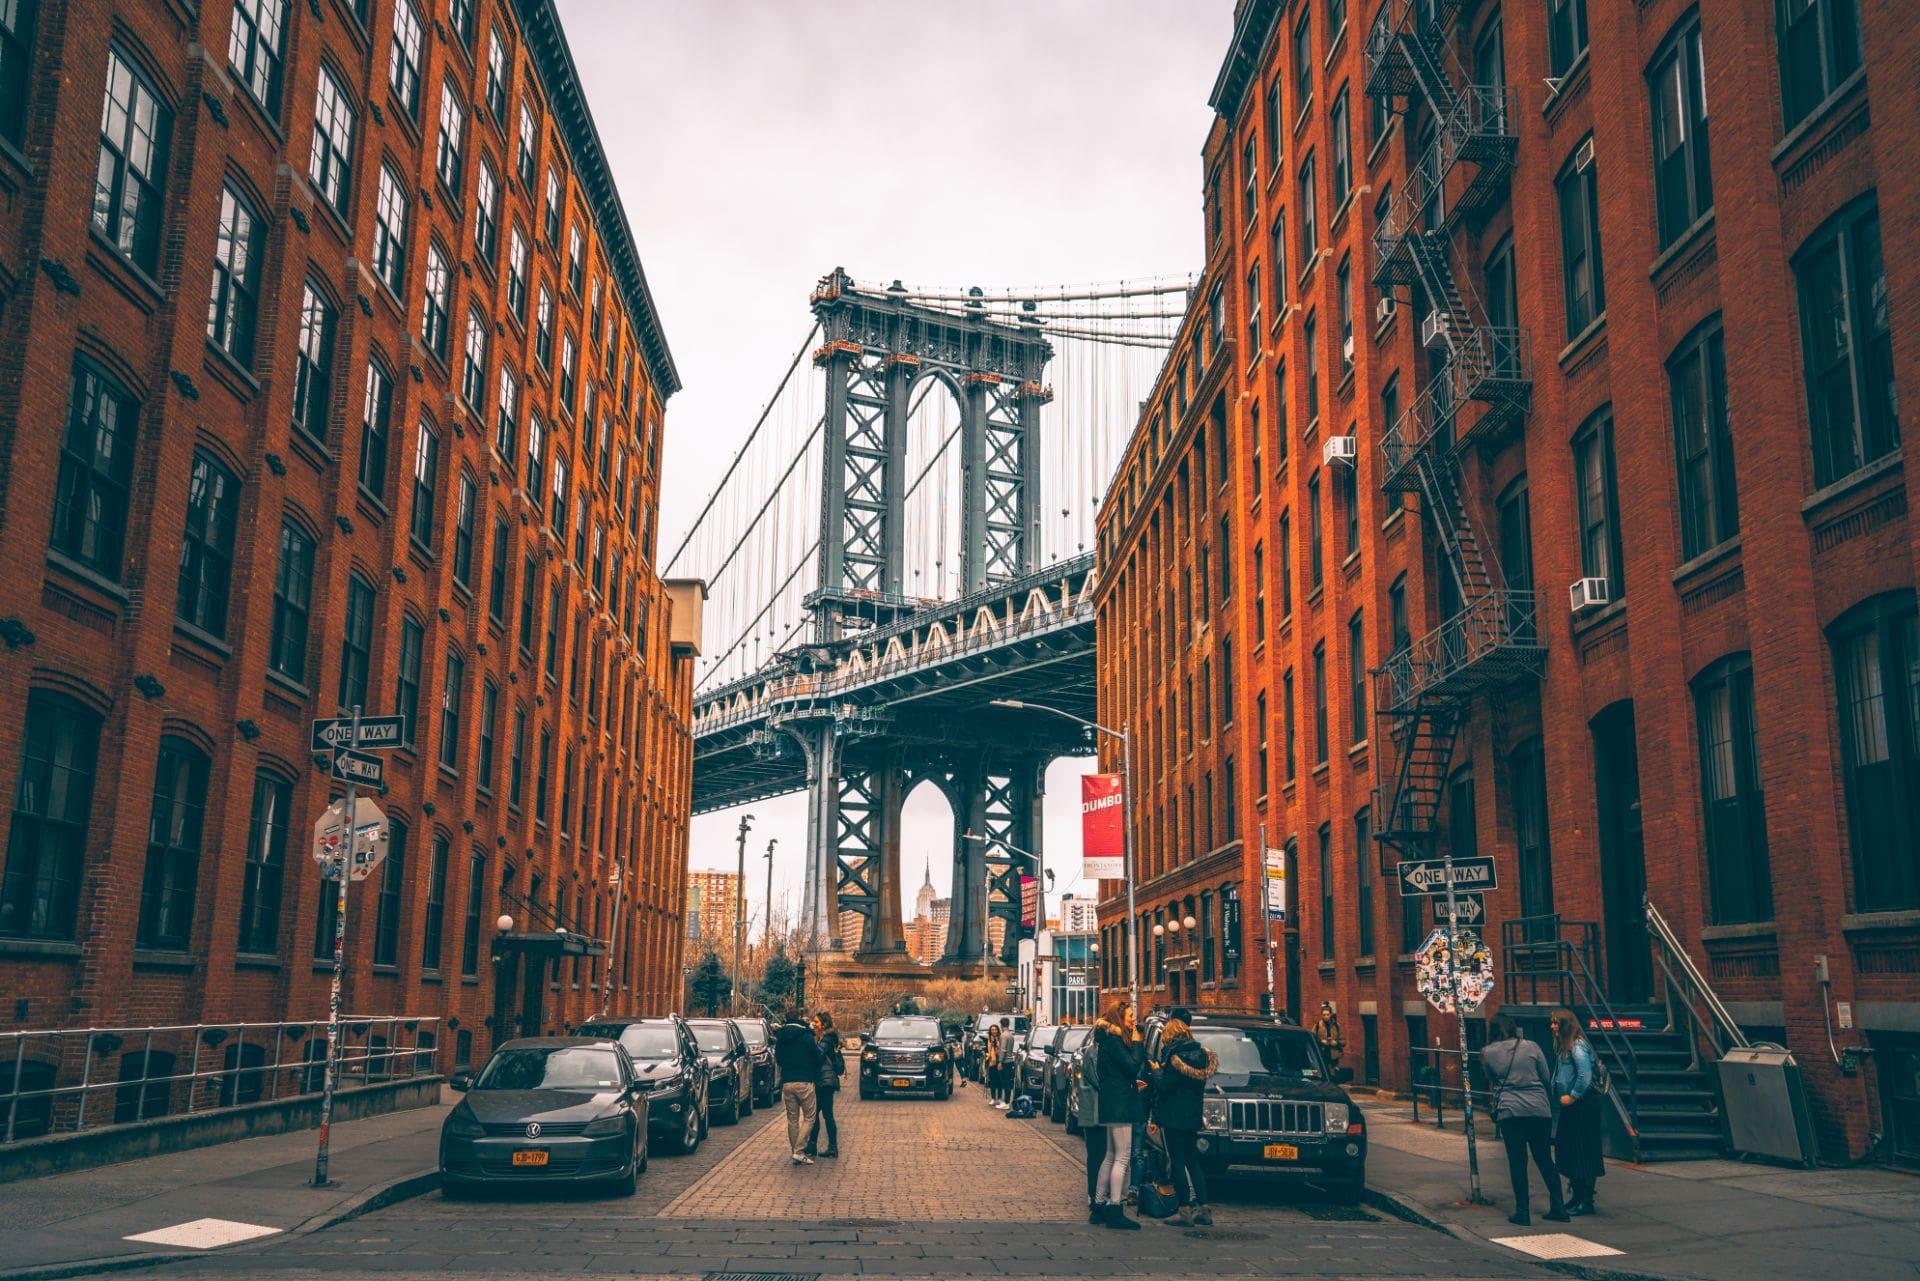 manhattan-bridge-seen-from-washington-street-and-water-street-dumbo-brooklyn-new-york-in-4-days